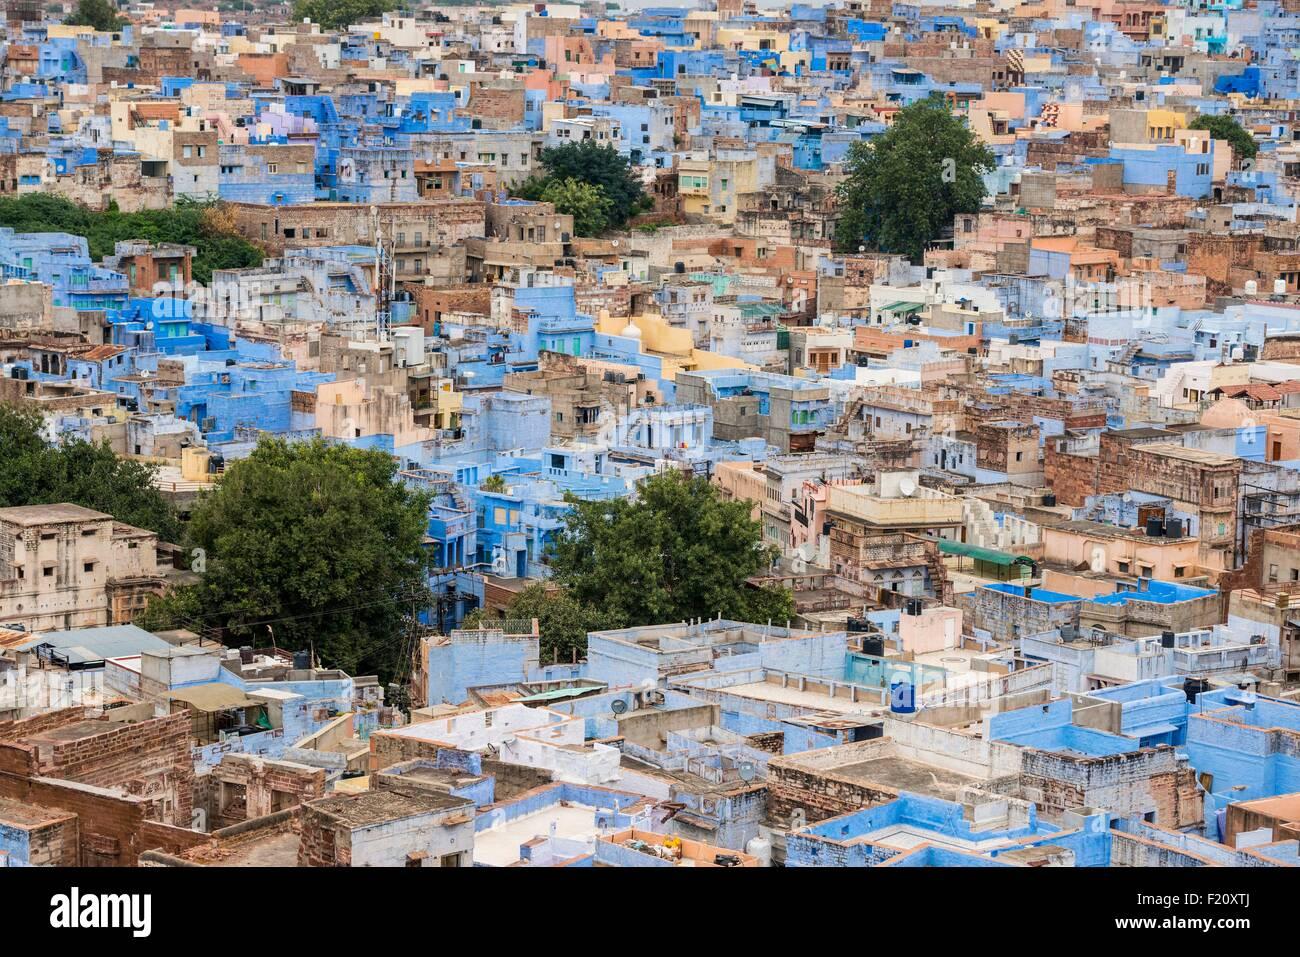 L'Inde, Rajasthan, Jodhpur, la ville bleue Banque D'Images